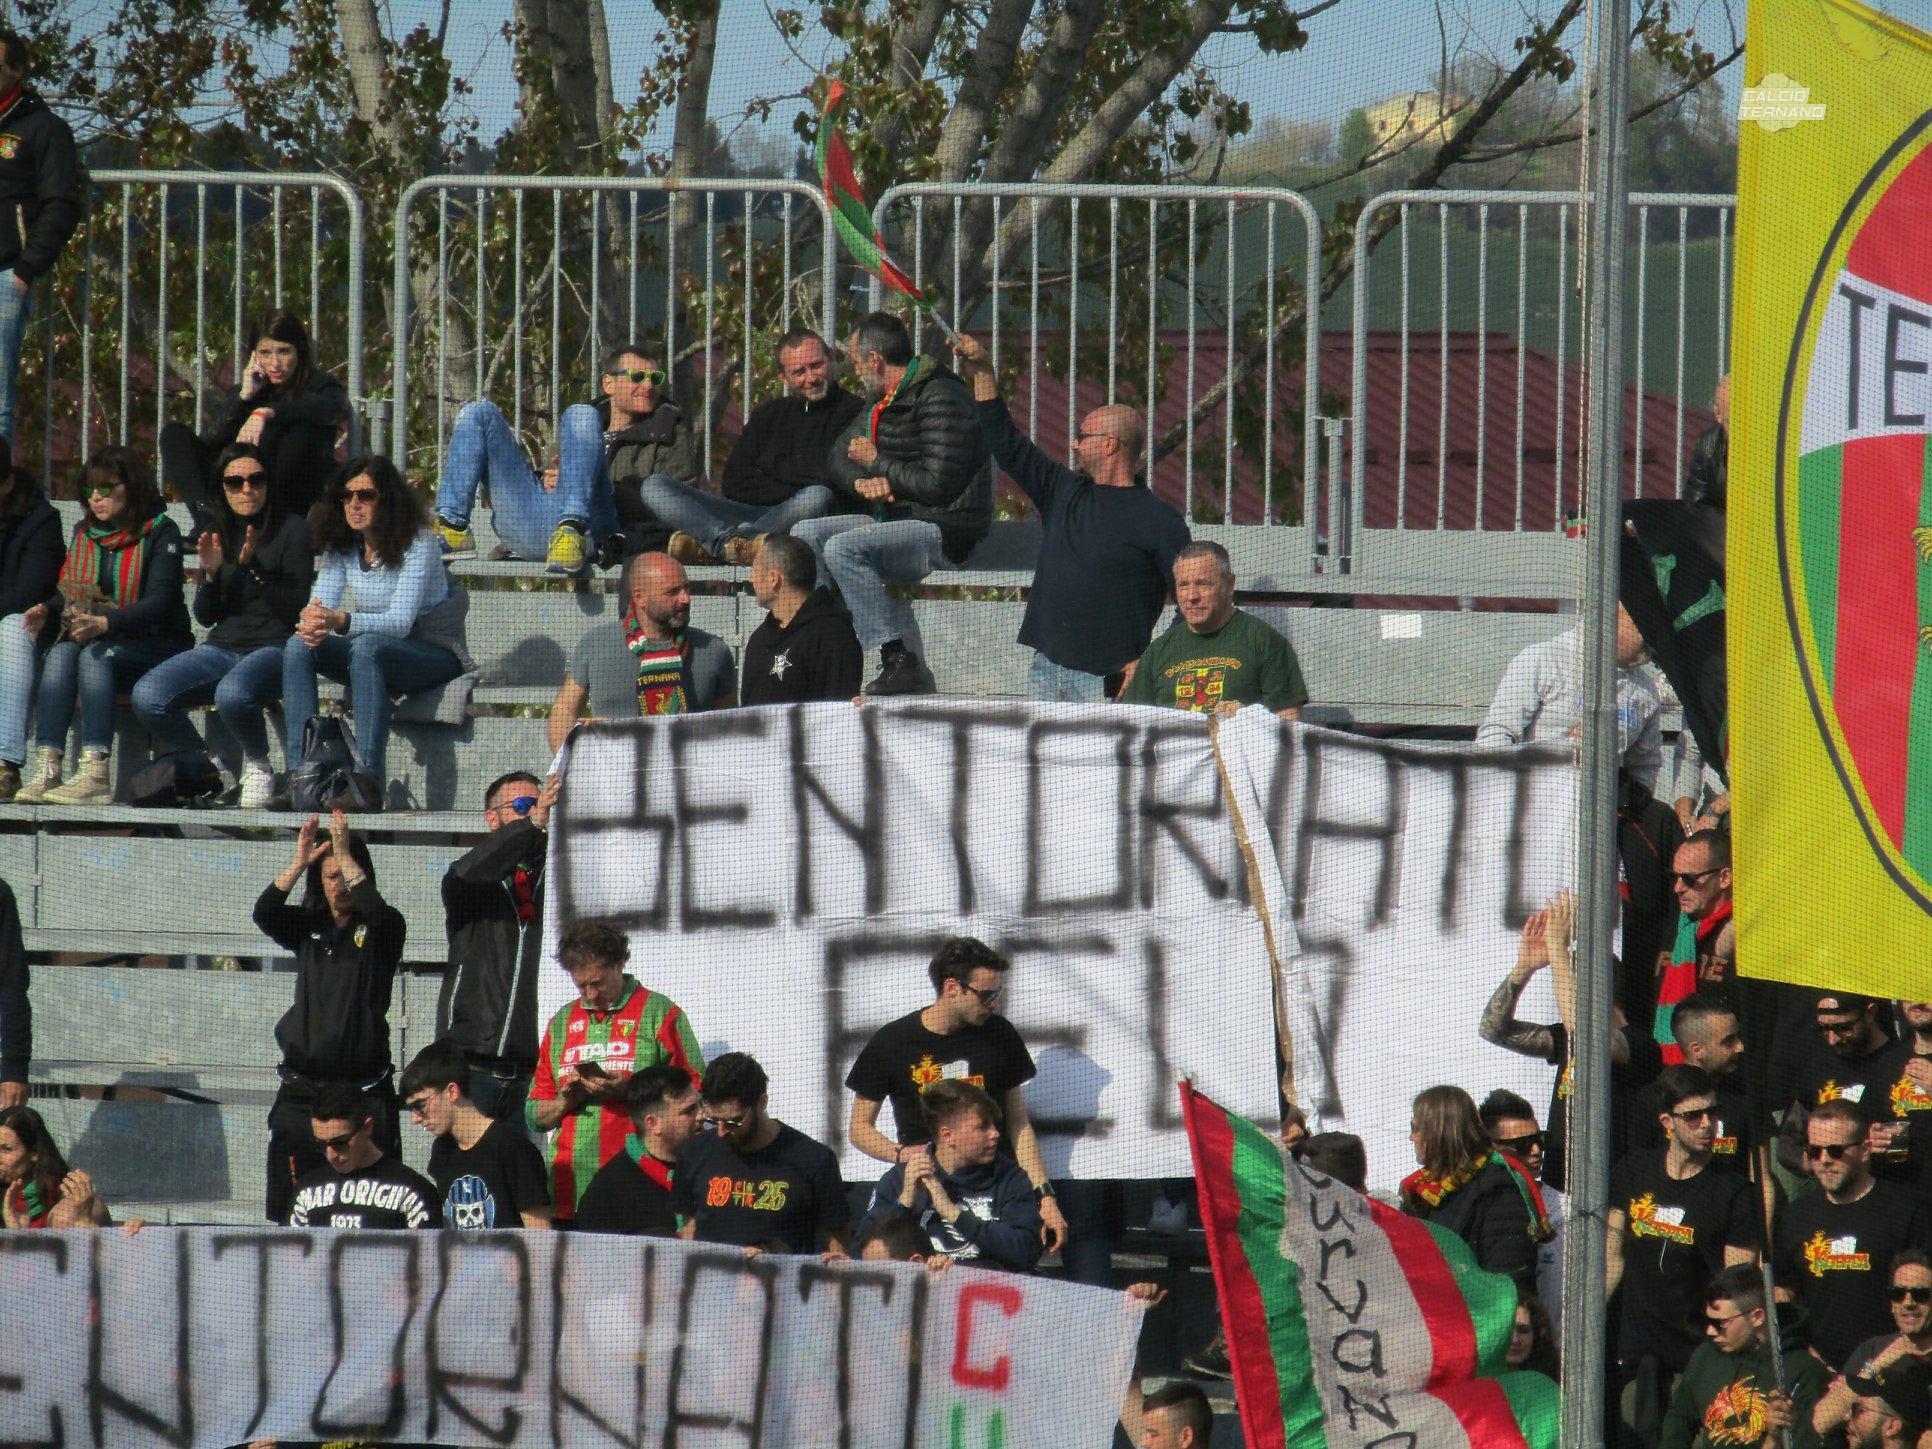 Lega Pro Teramo-Ternana, i tifosi rossoverdi organizzano la trasferta